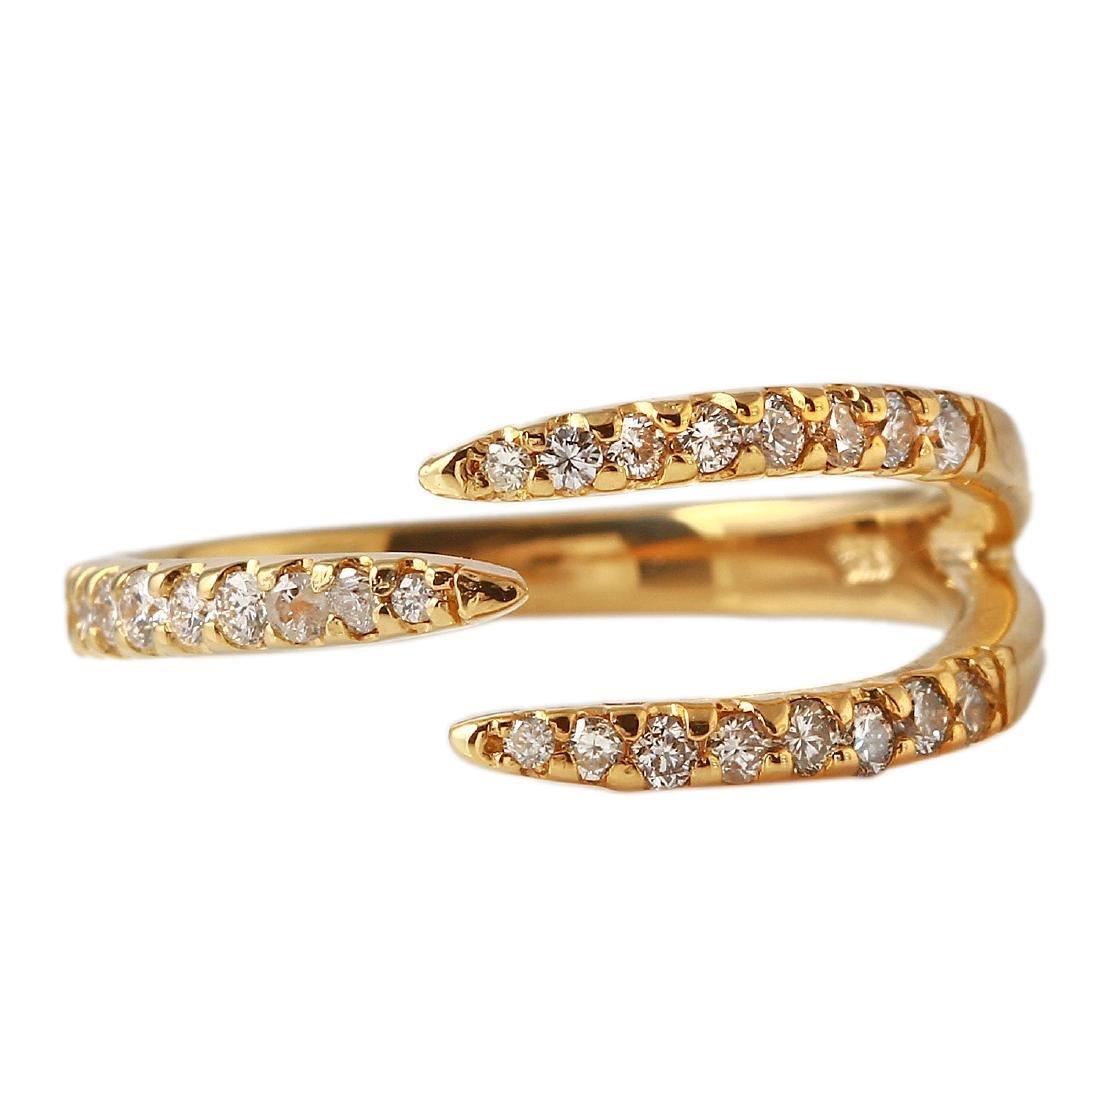 0.32 Carat Natural Diamond 18K Solid Yellow Gold Ring